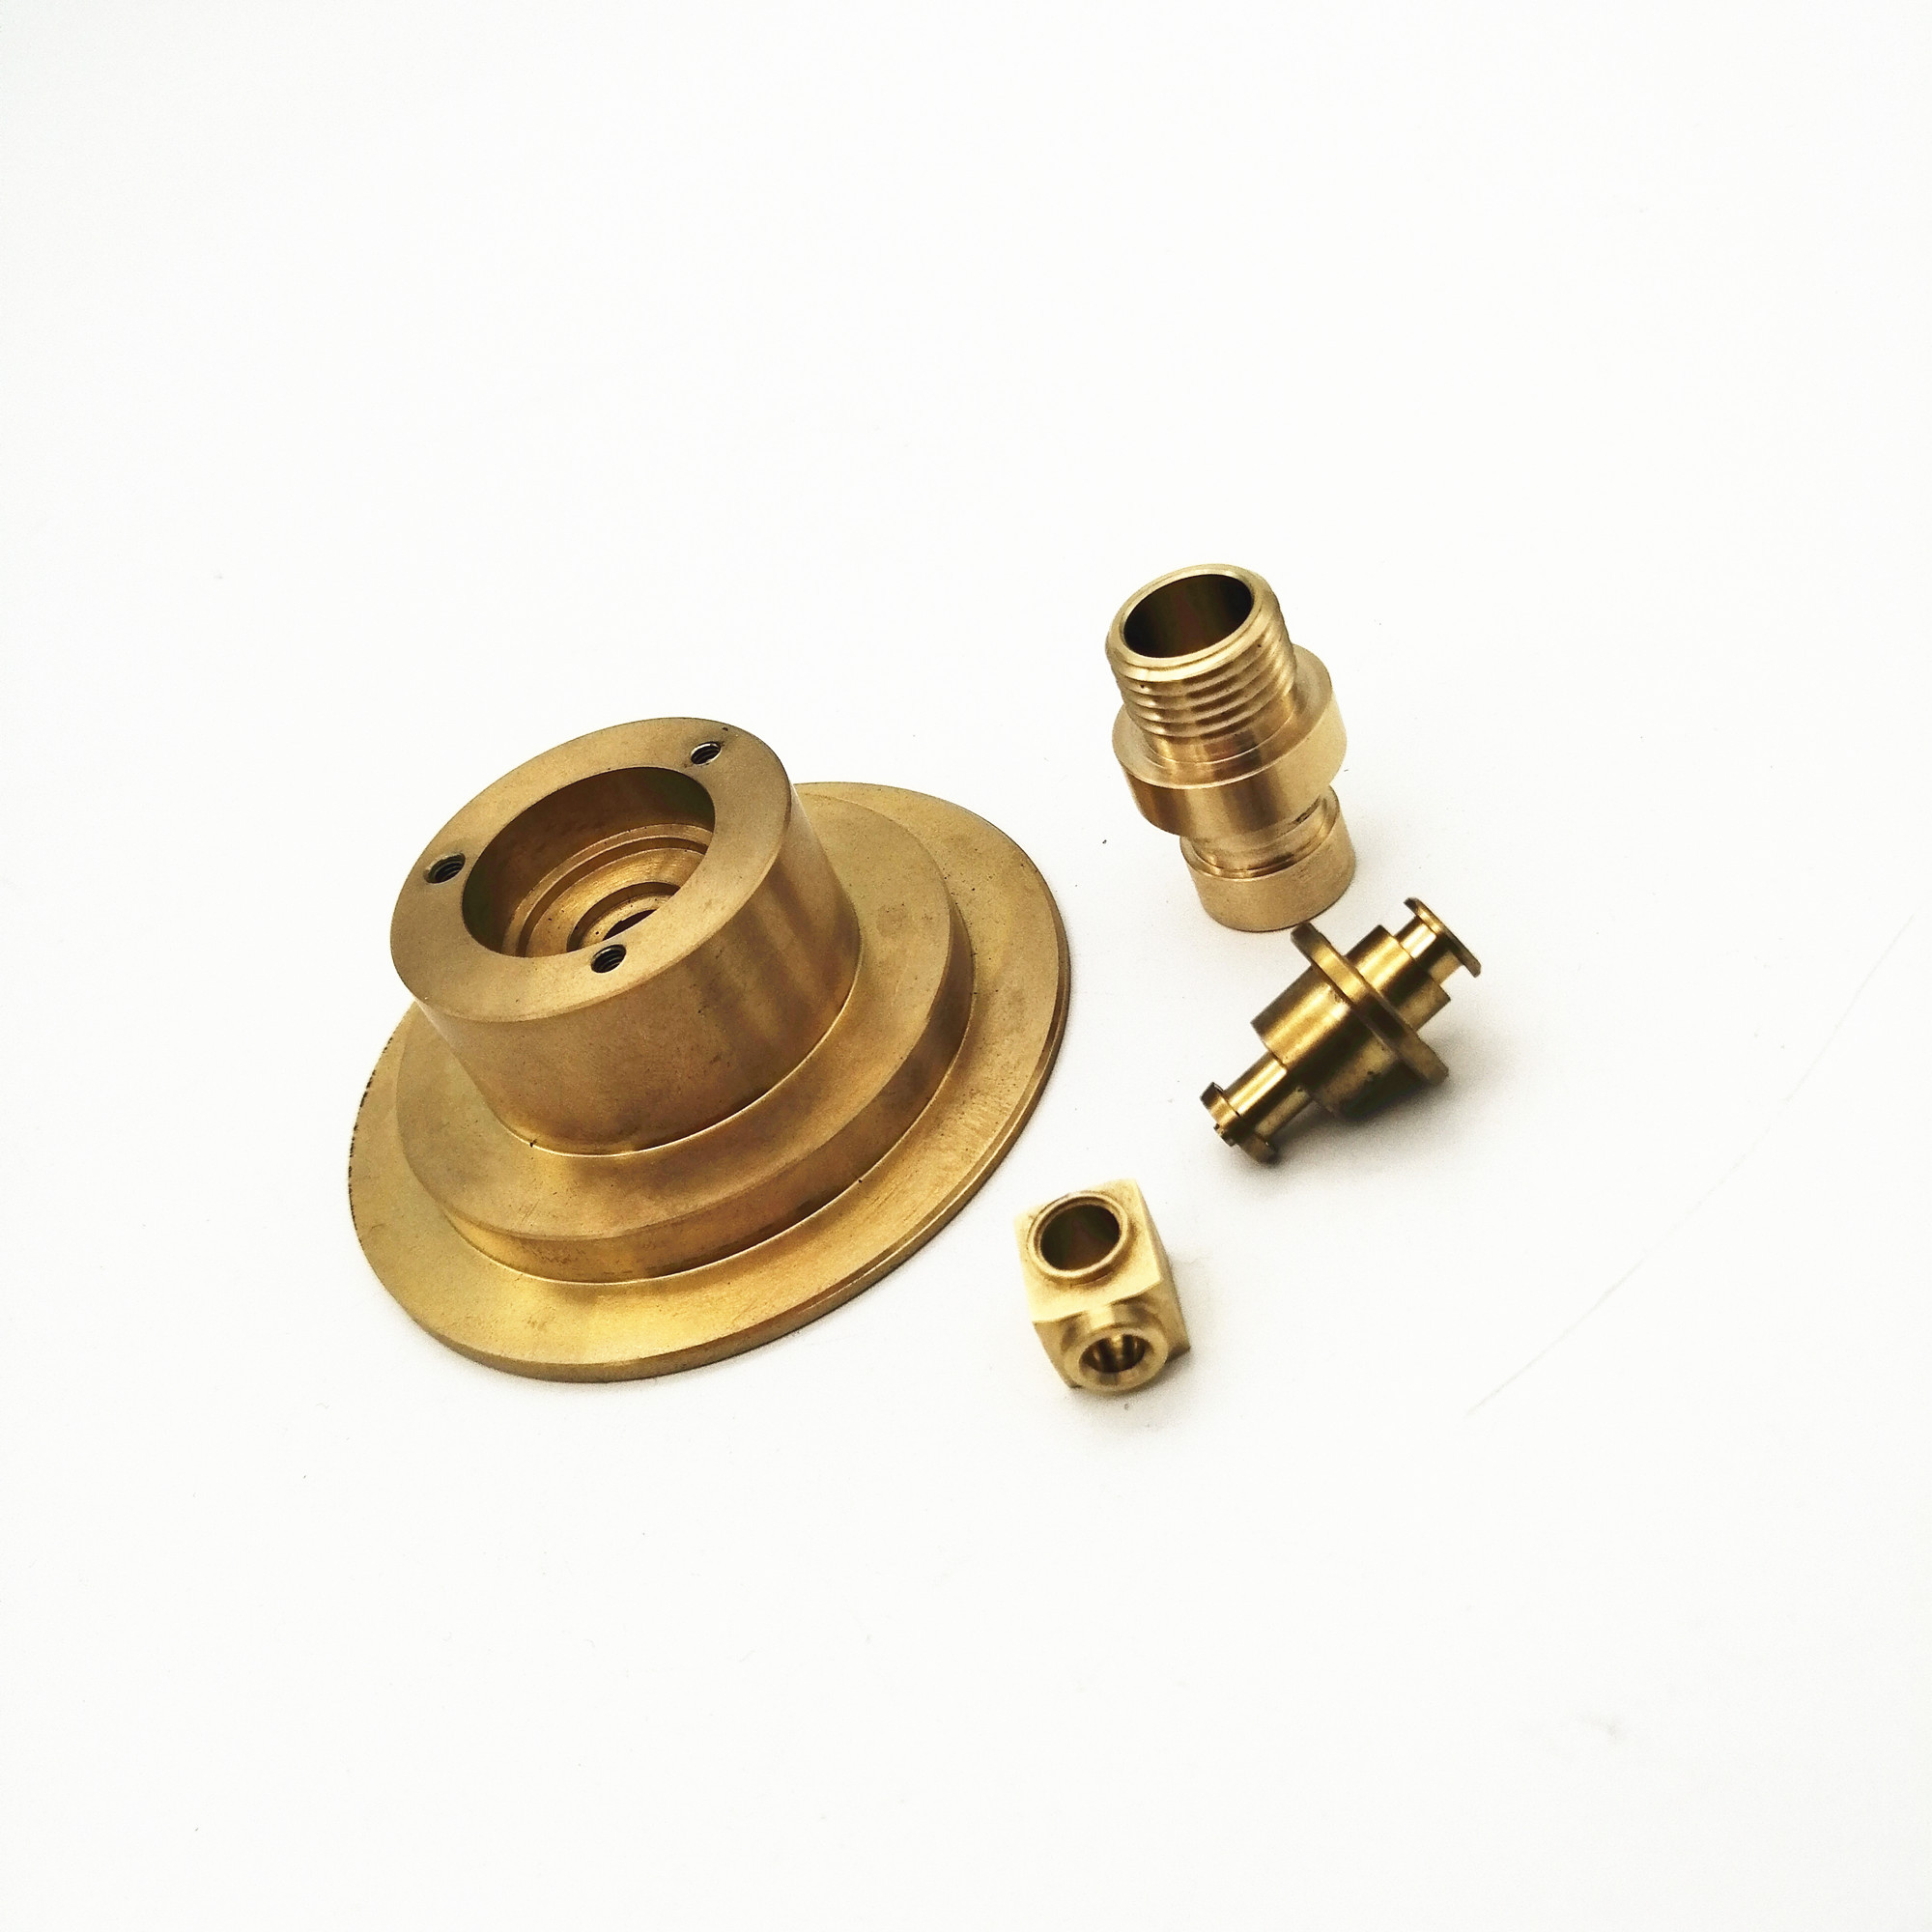 NBridge OEM 3D Printer Parts Accessories for Metal Parts